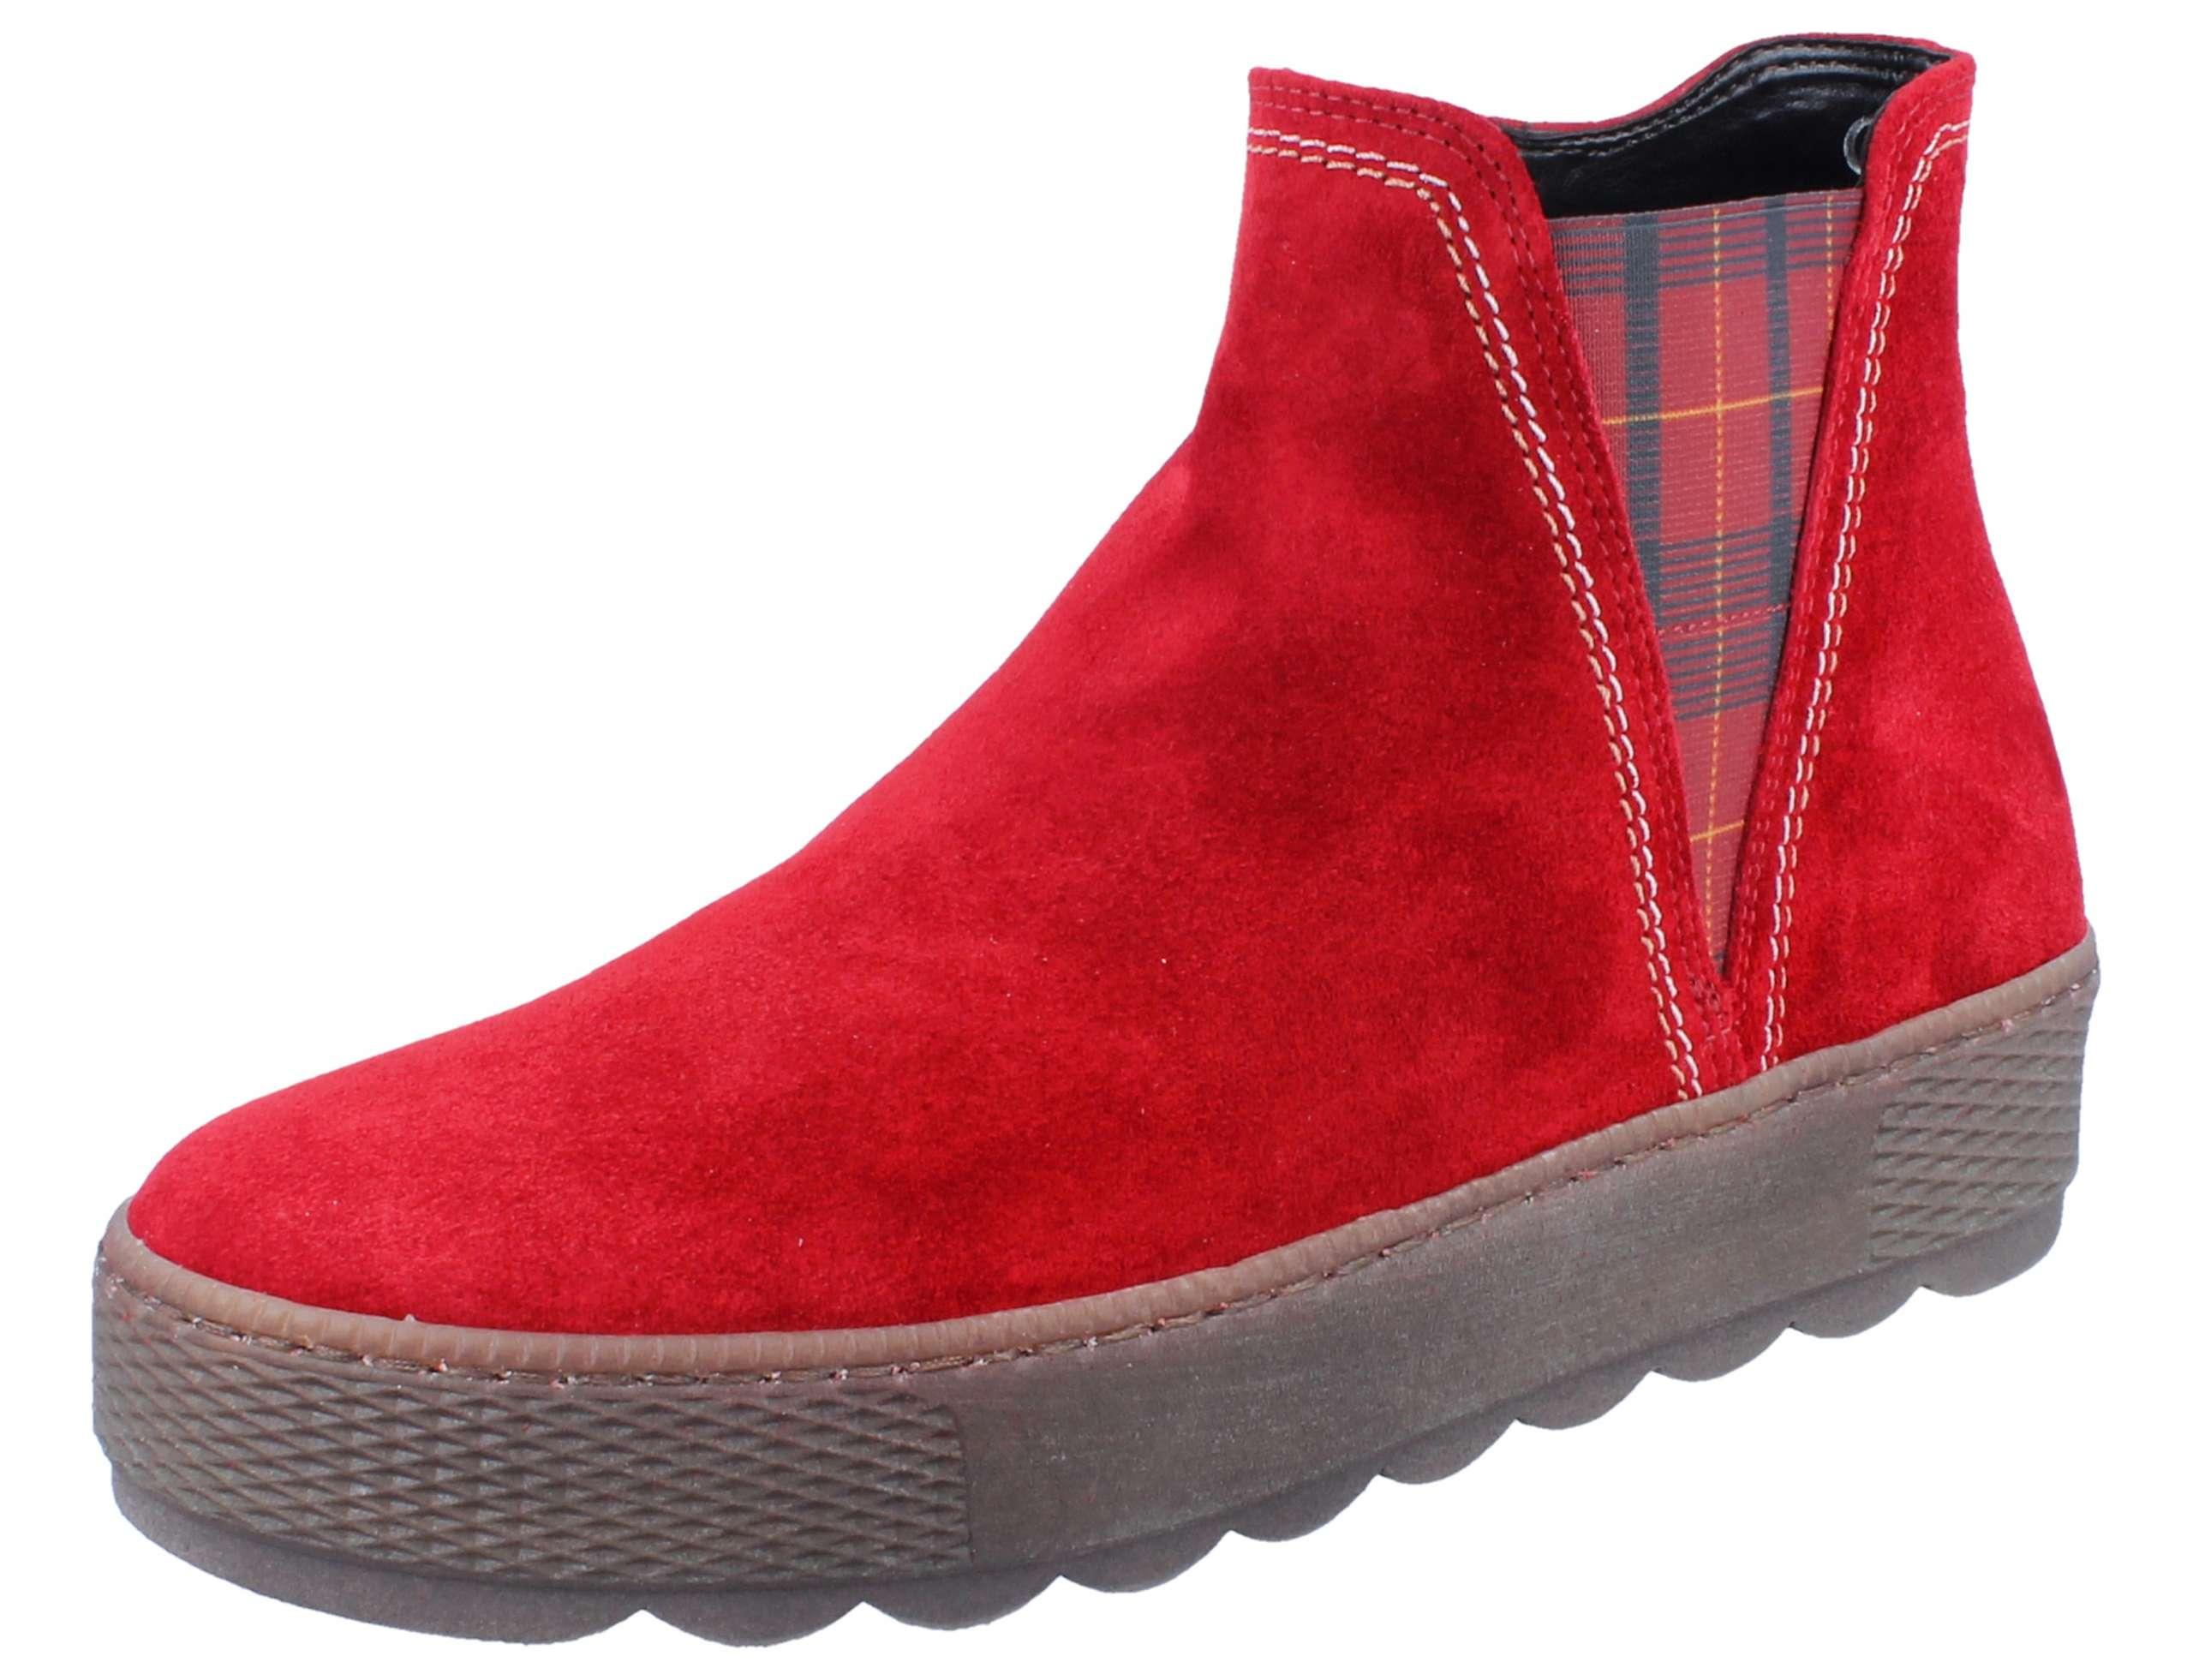 Rotdreamvelour Boots Boots Rotdreamvelour Comfort Chelsea